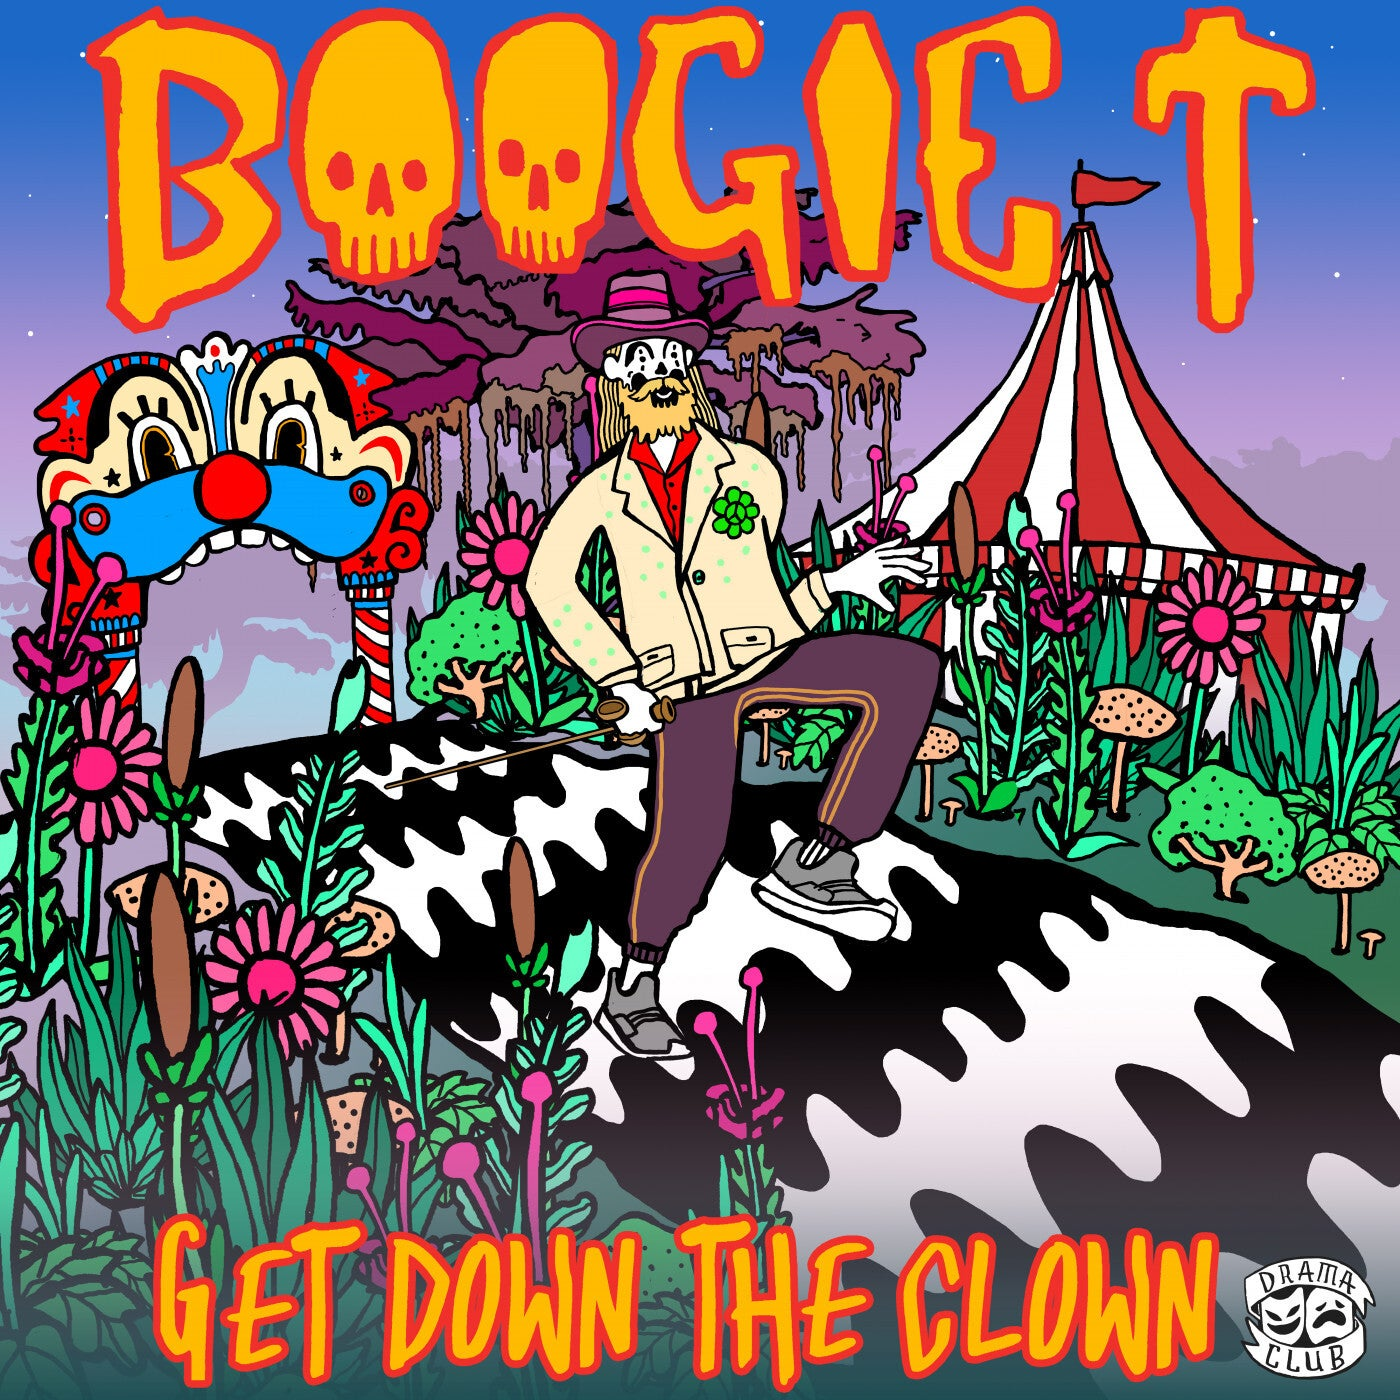 Get Down The Clown (Original Mix)